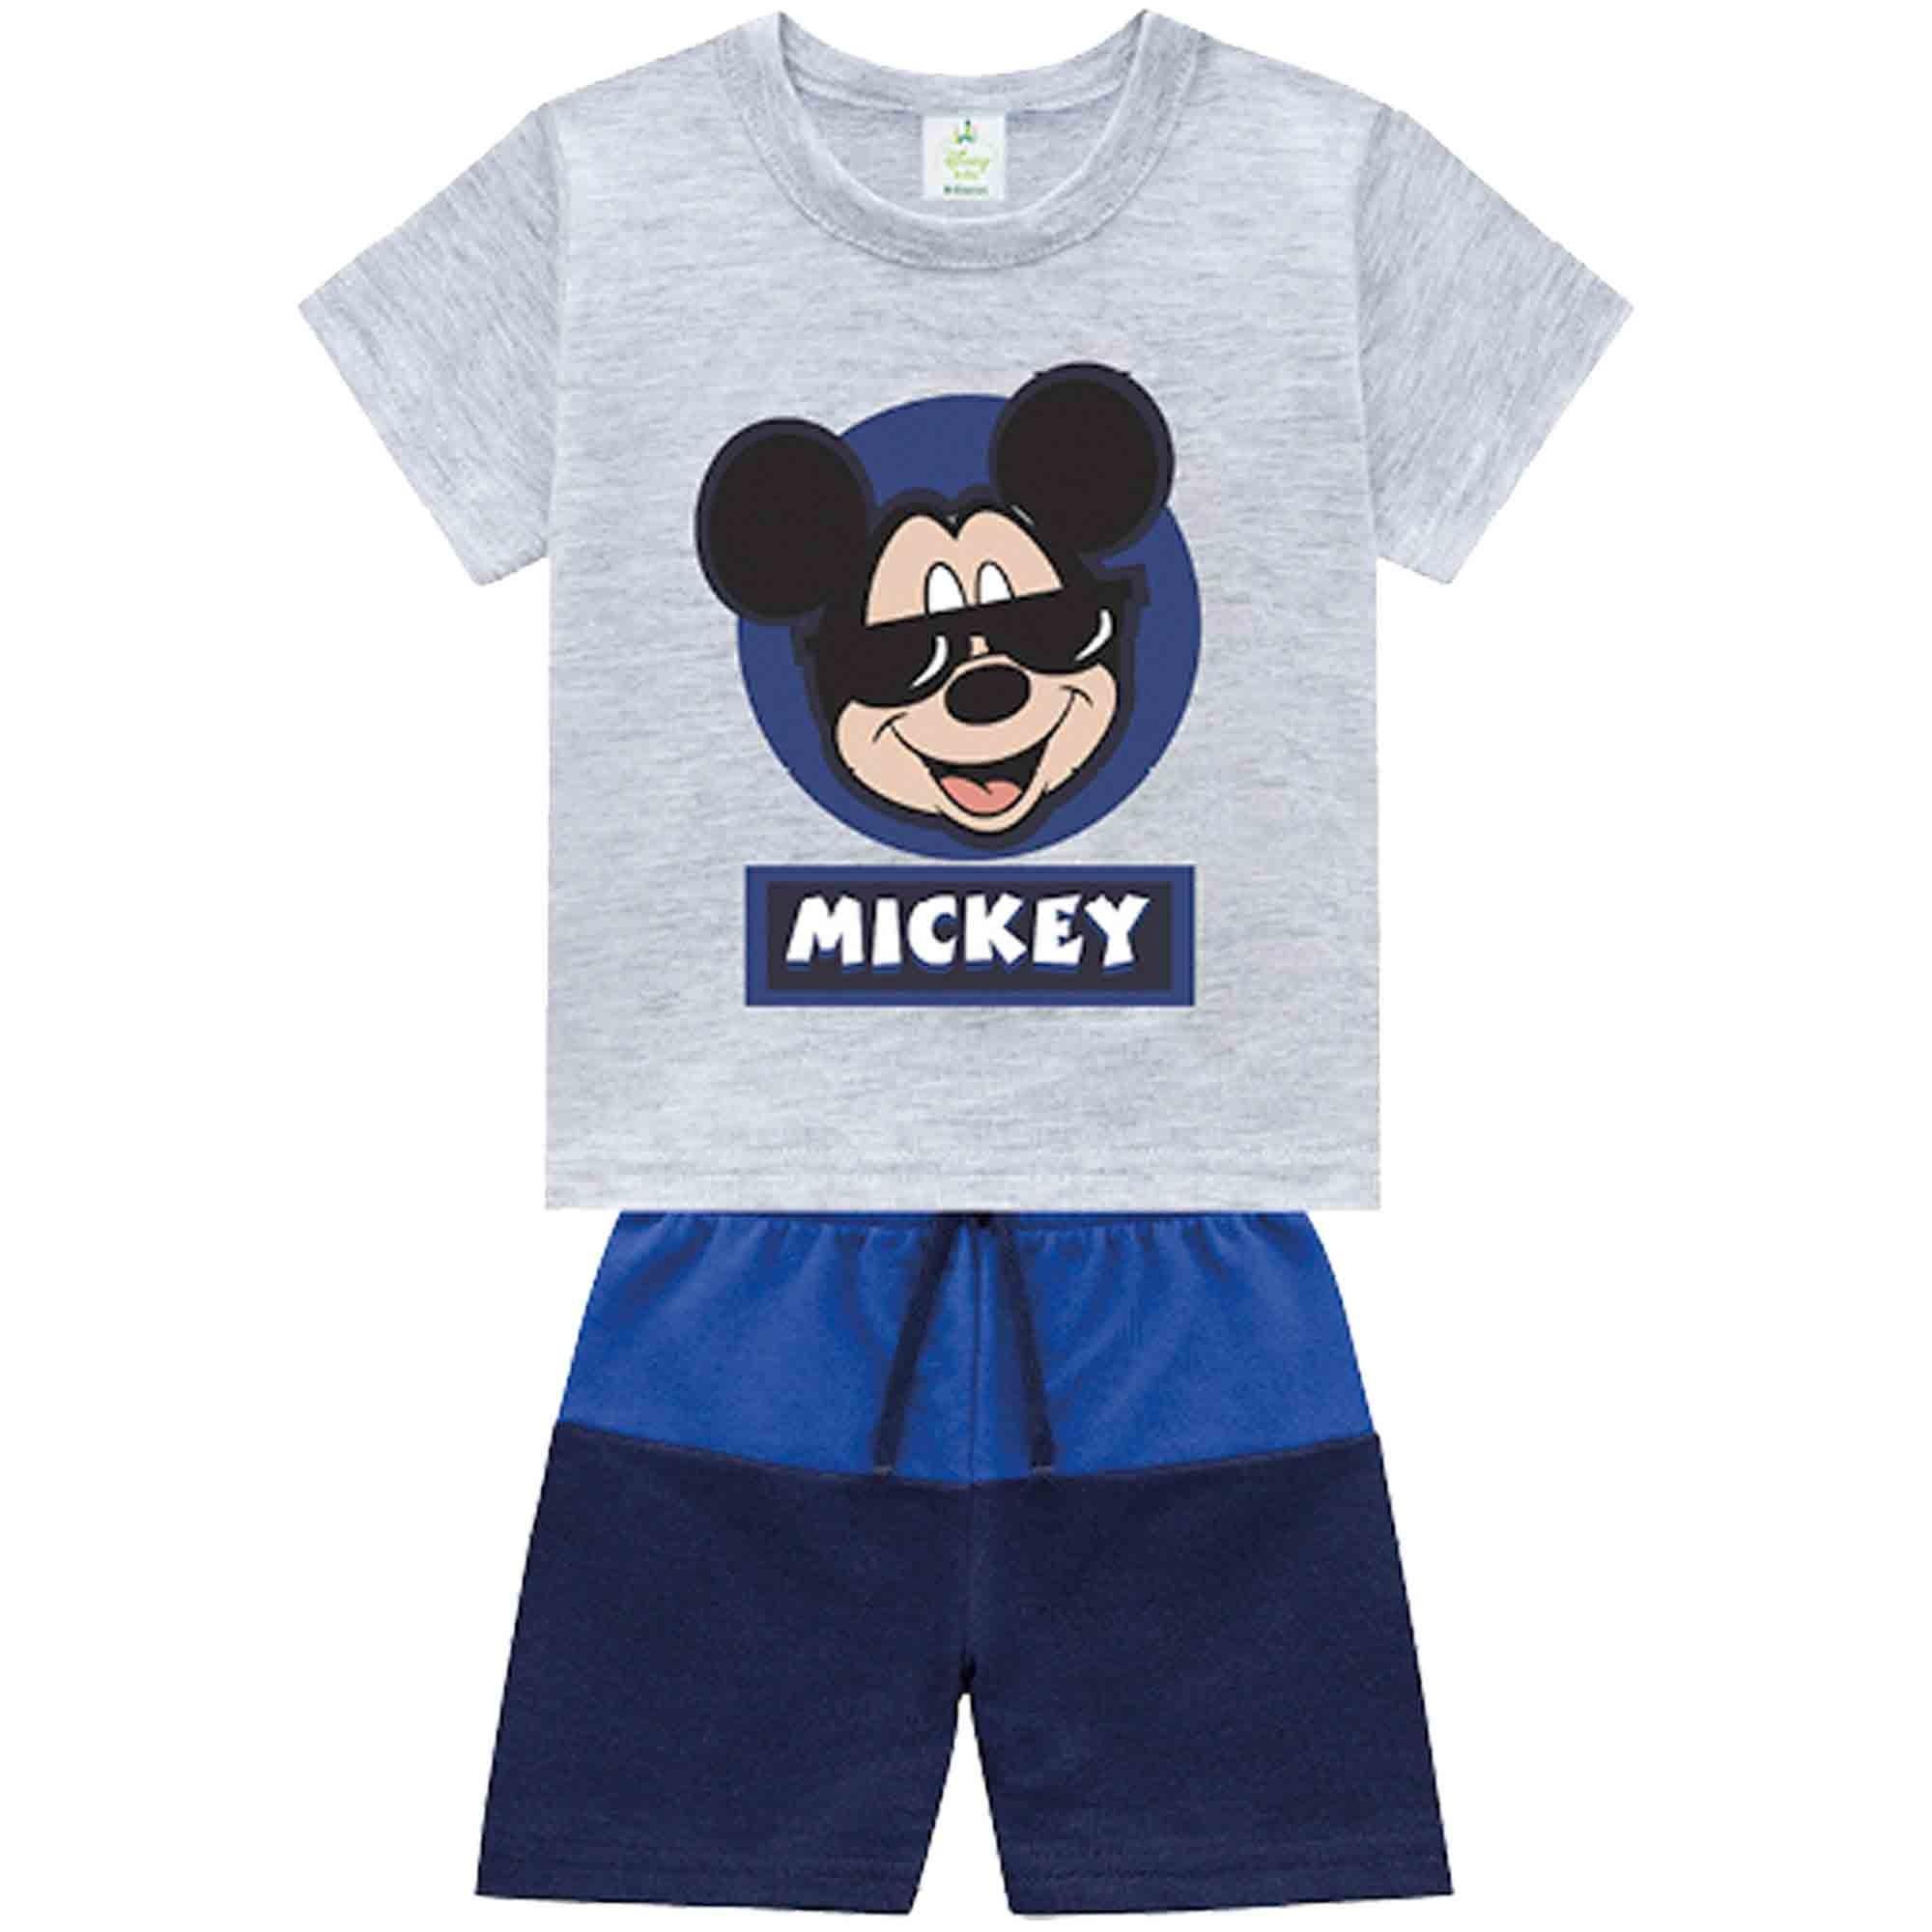 Conjunto Verão Brandili Baby Camiseta Mickey com Bermuda Moletinho - P ao G